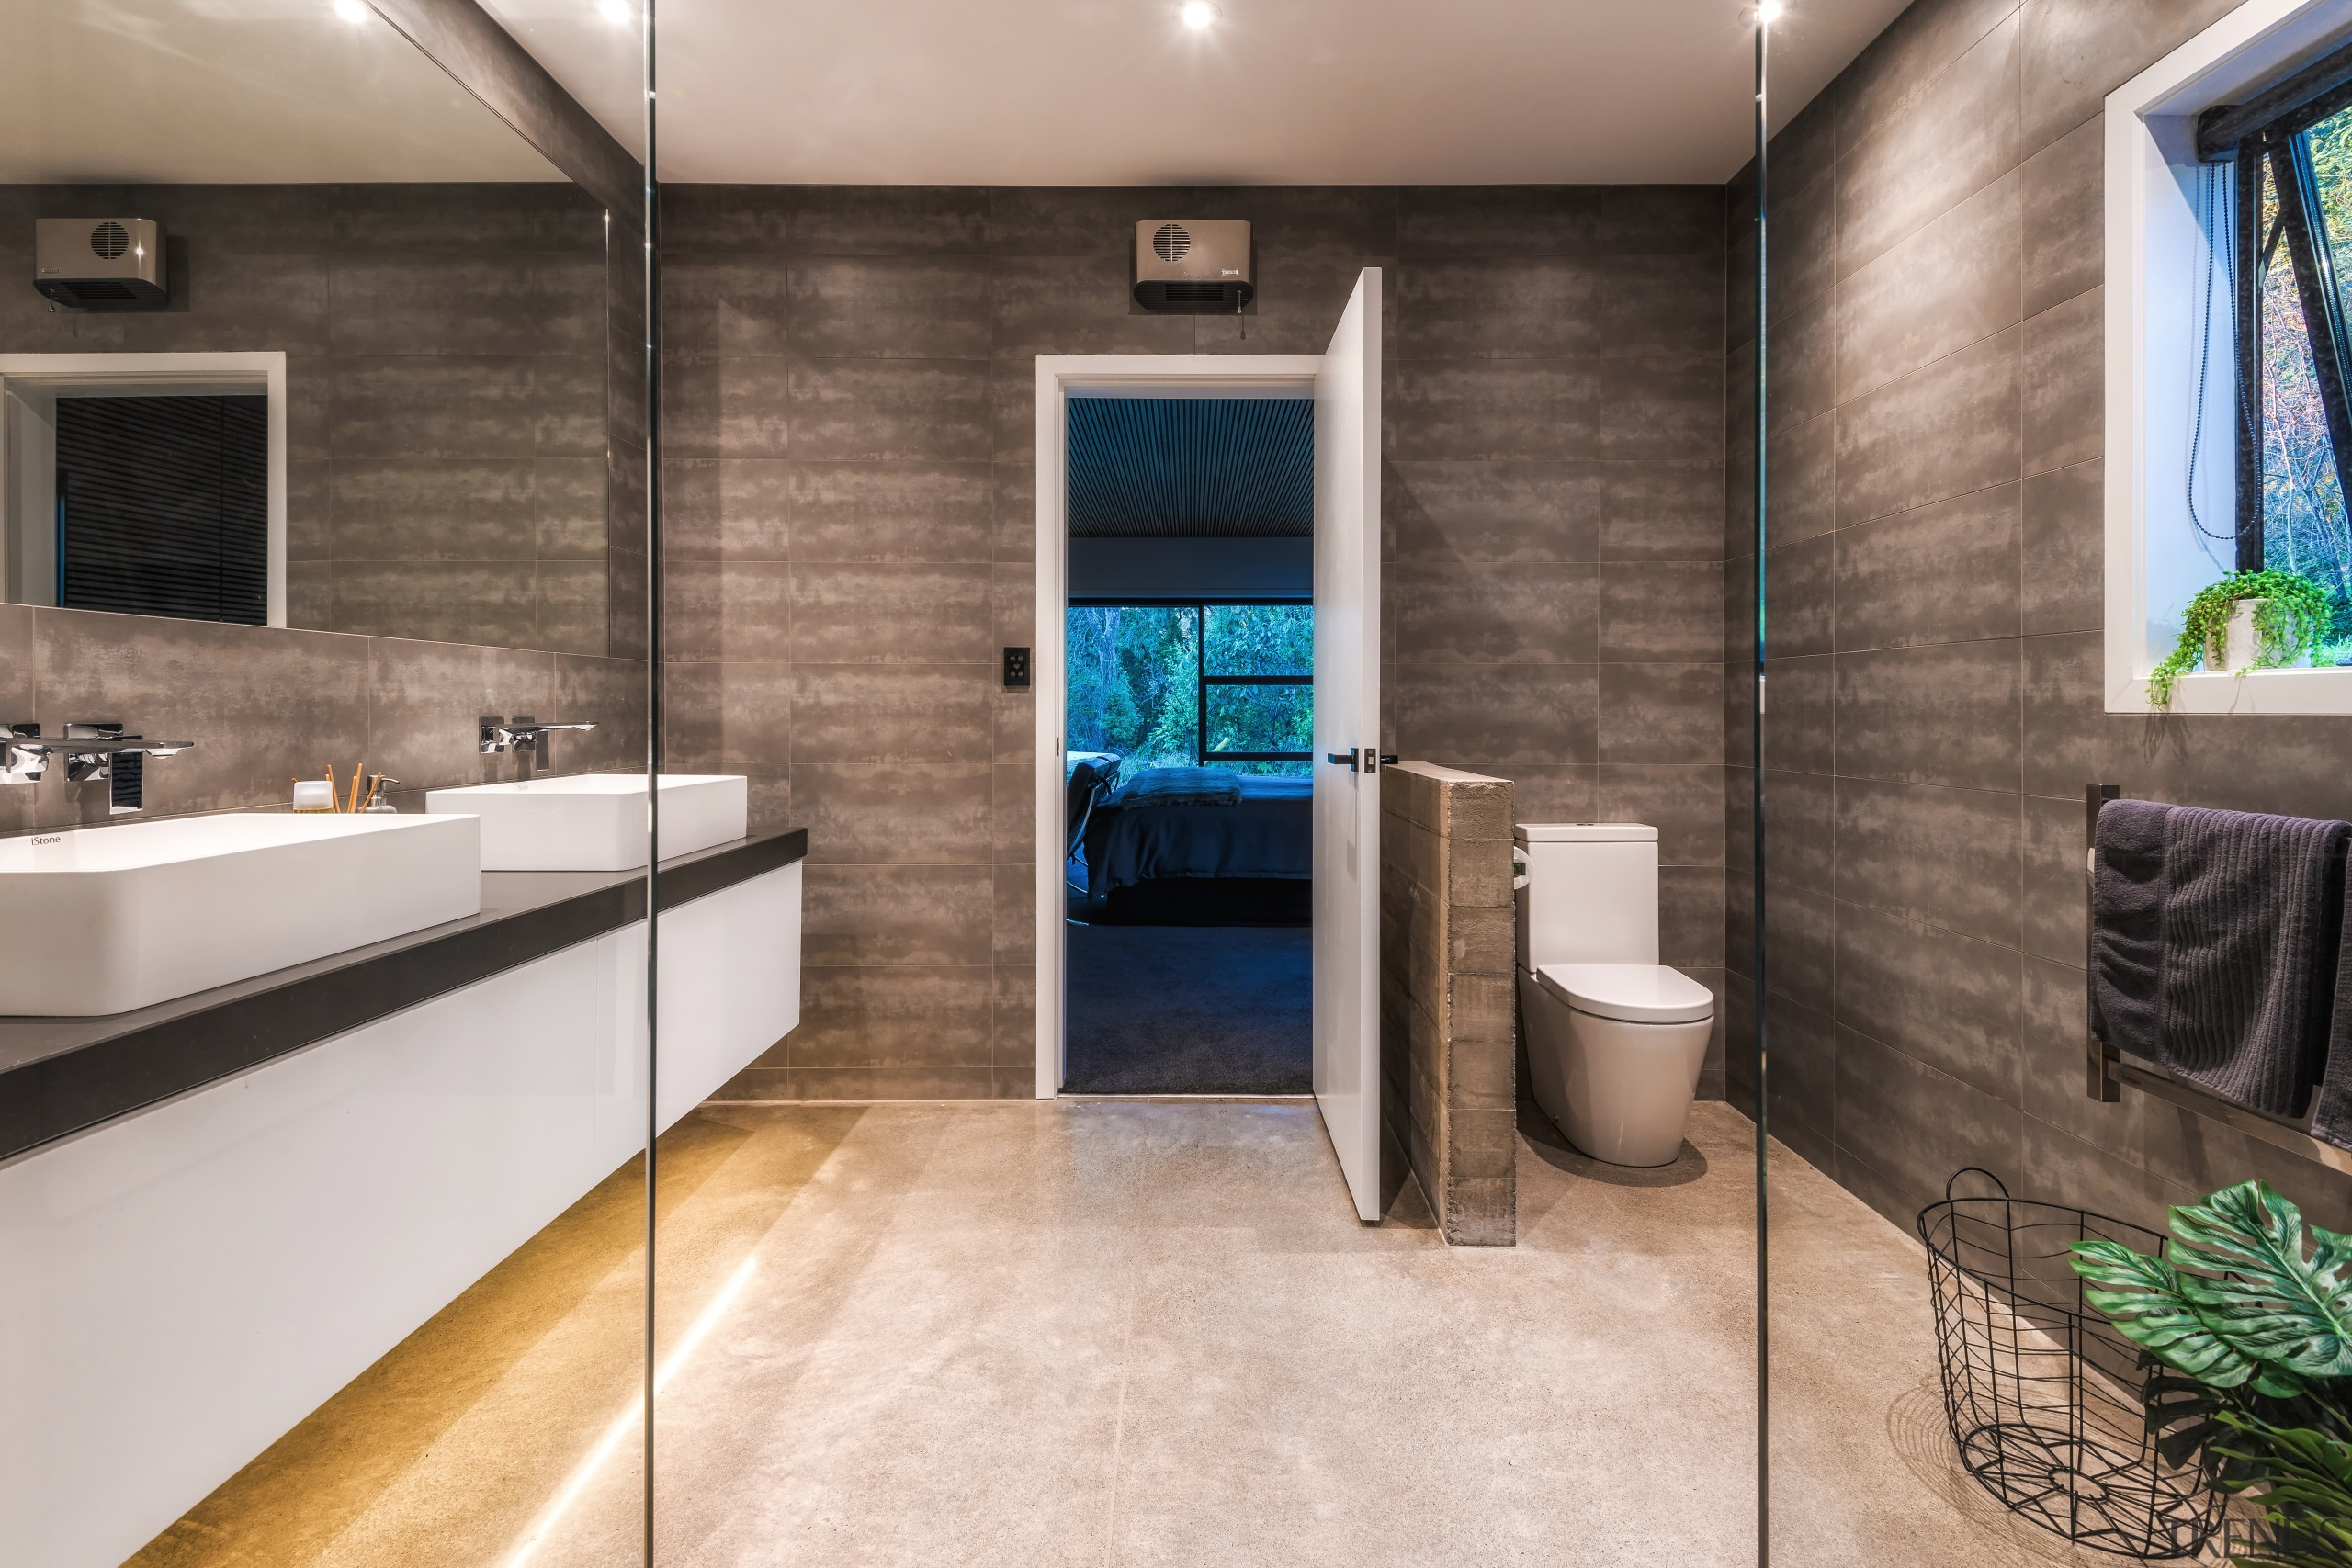 A low raw concrete nib wall provides some bathroom, floor, flooring, interior design, tile, gray, master suite, Kirsty Davis, vanity, shower